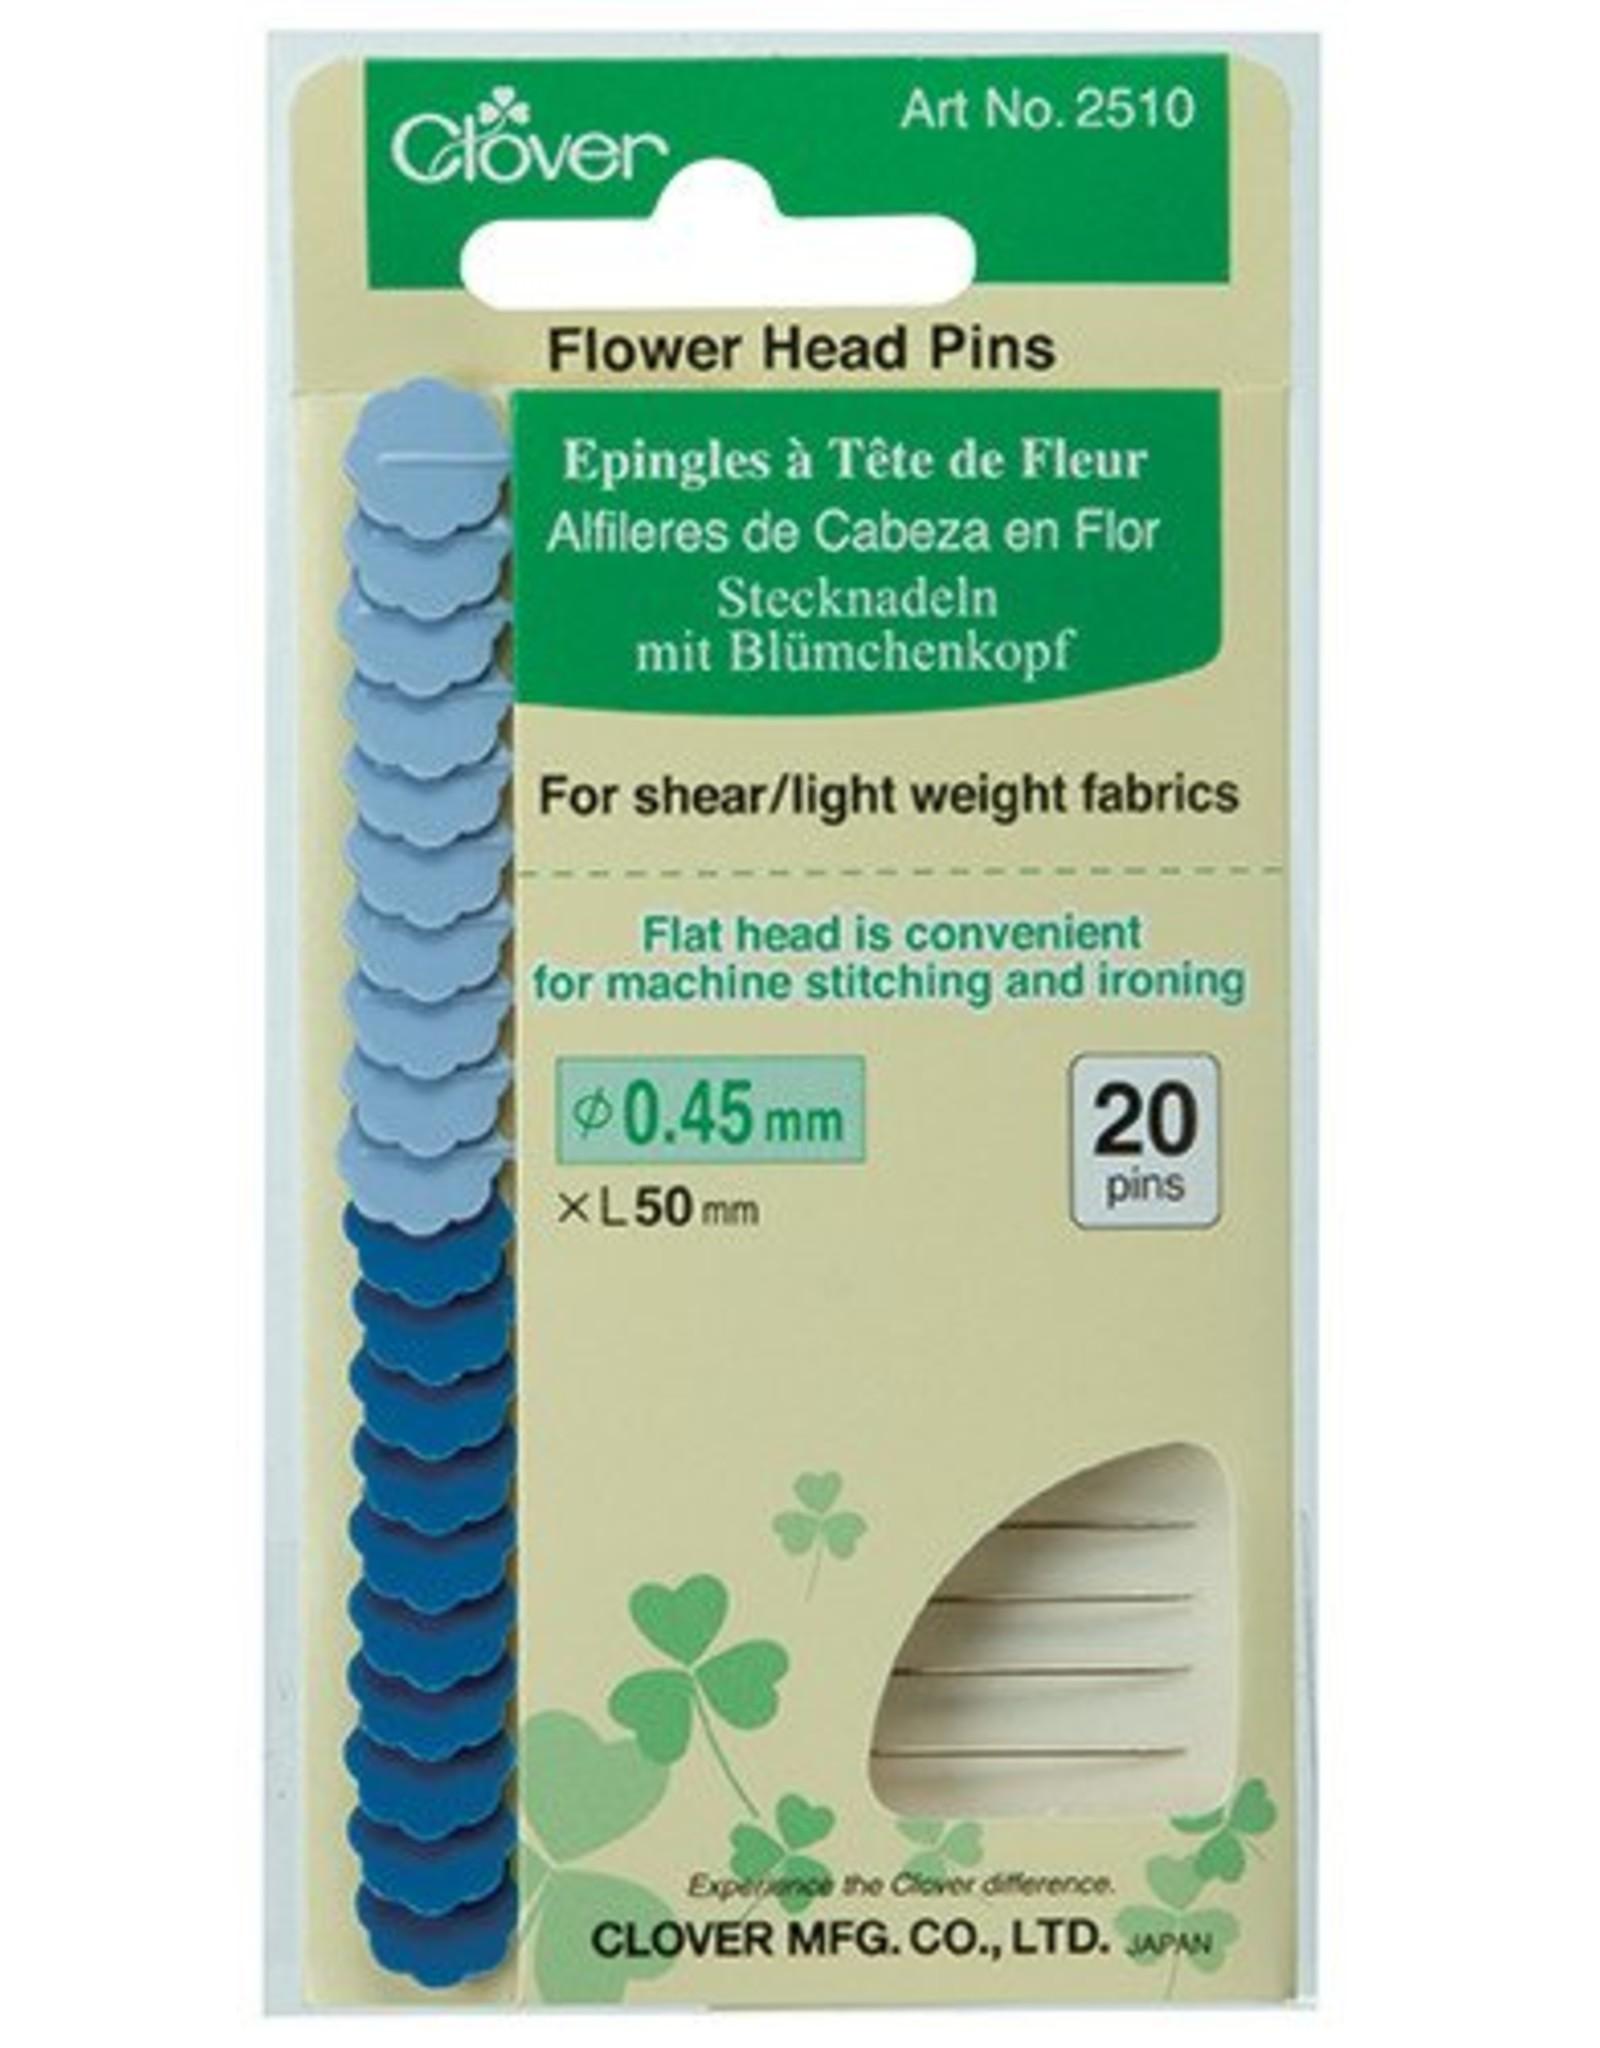 Clover Flower Head Pins - Fine